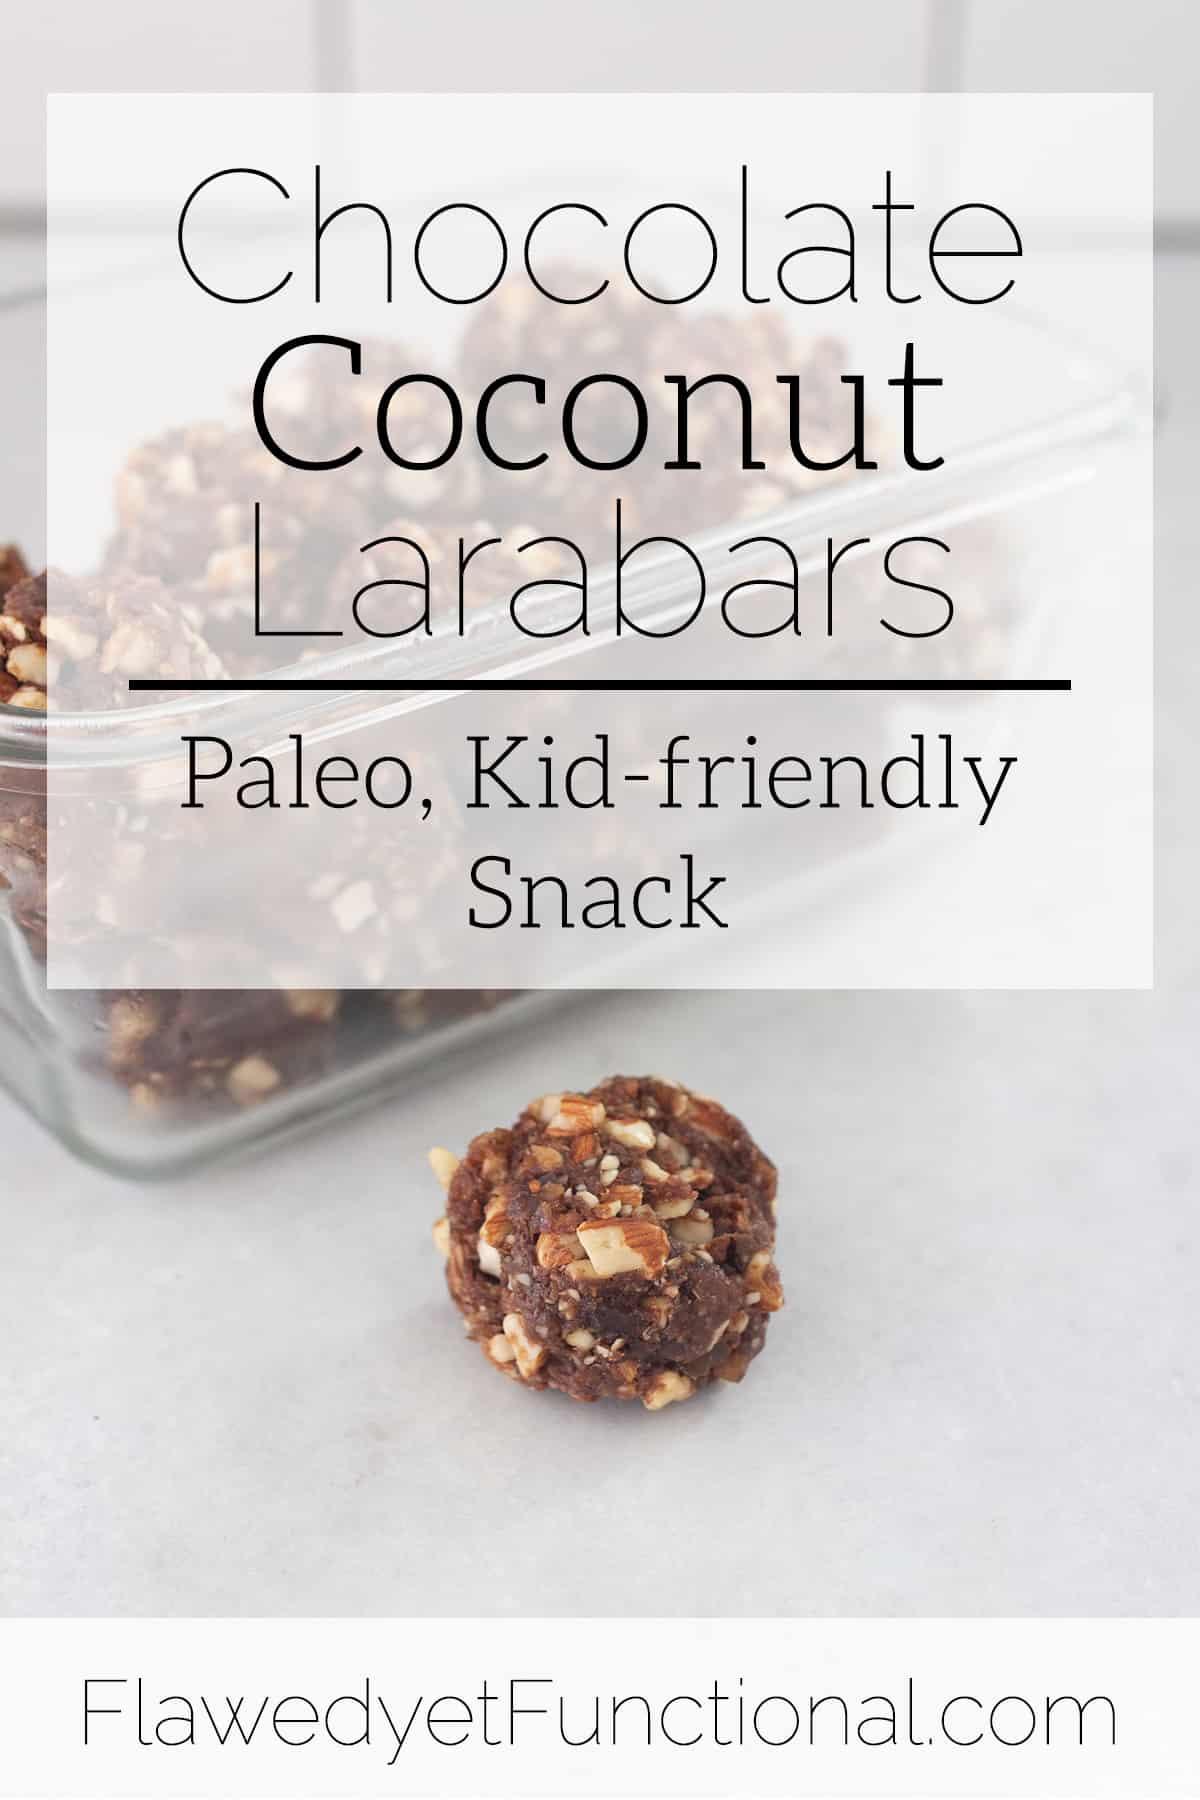 Chocolate Coconut Larabars | Kid-friendly Paleo Snack